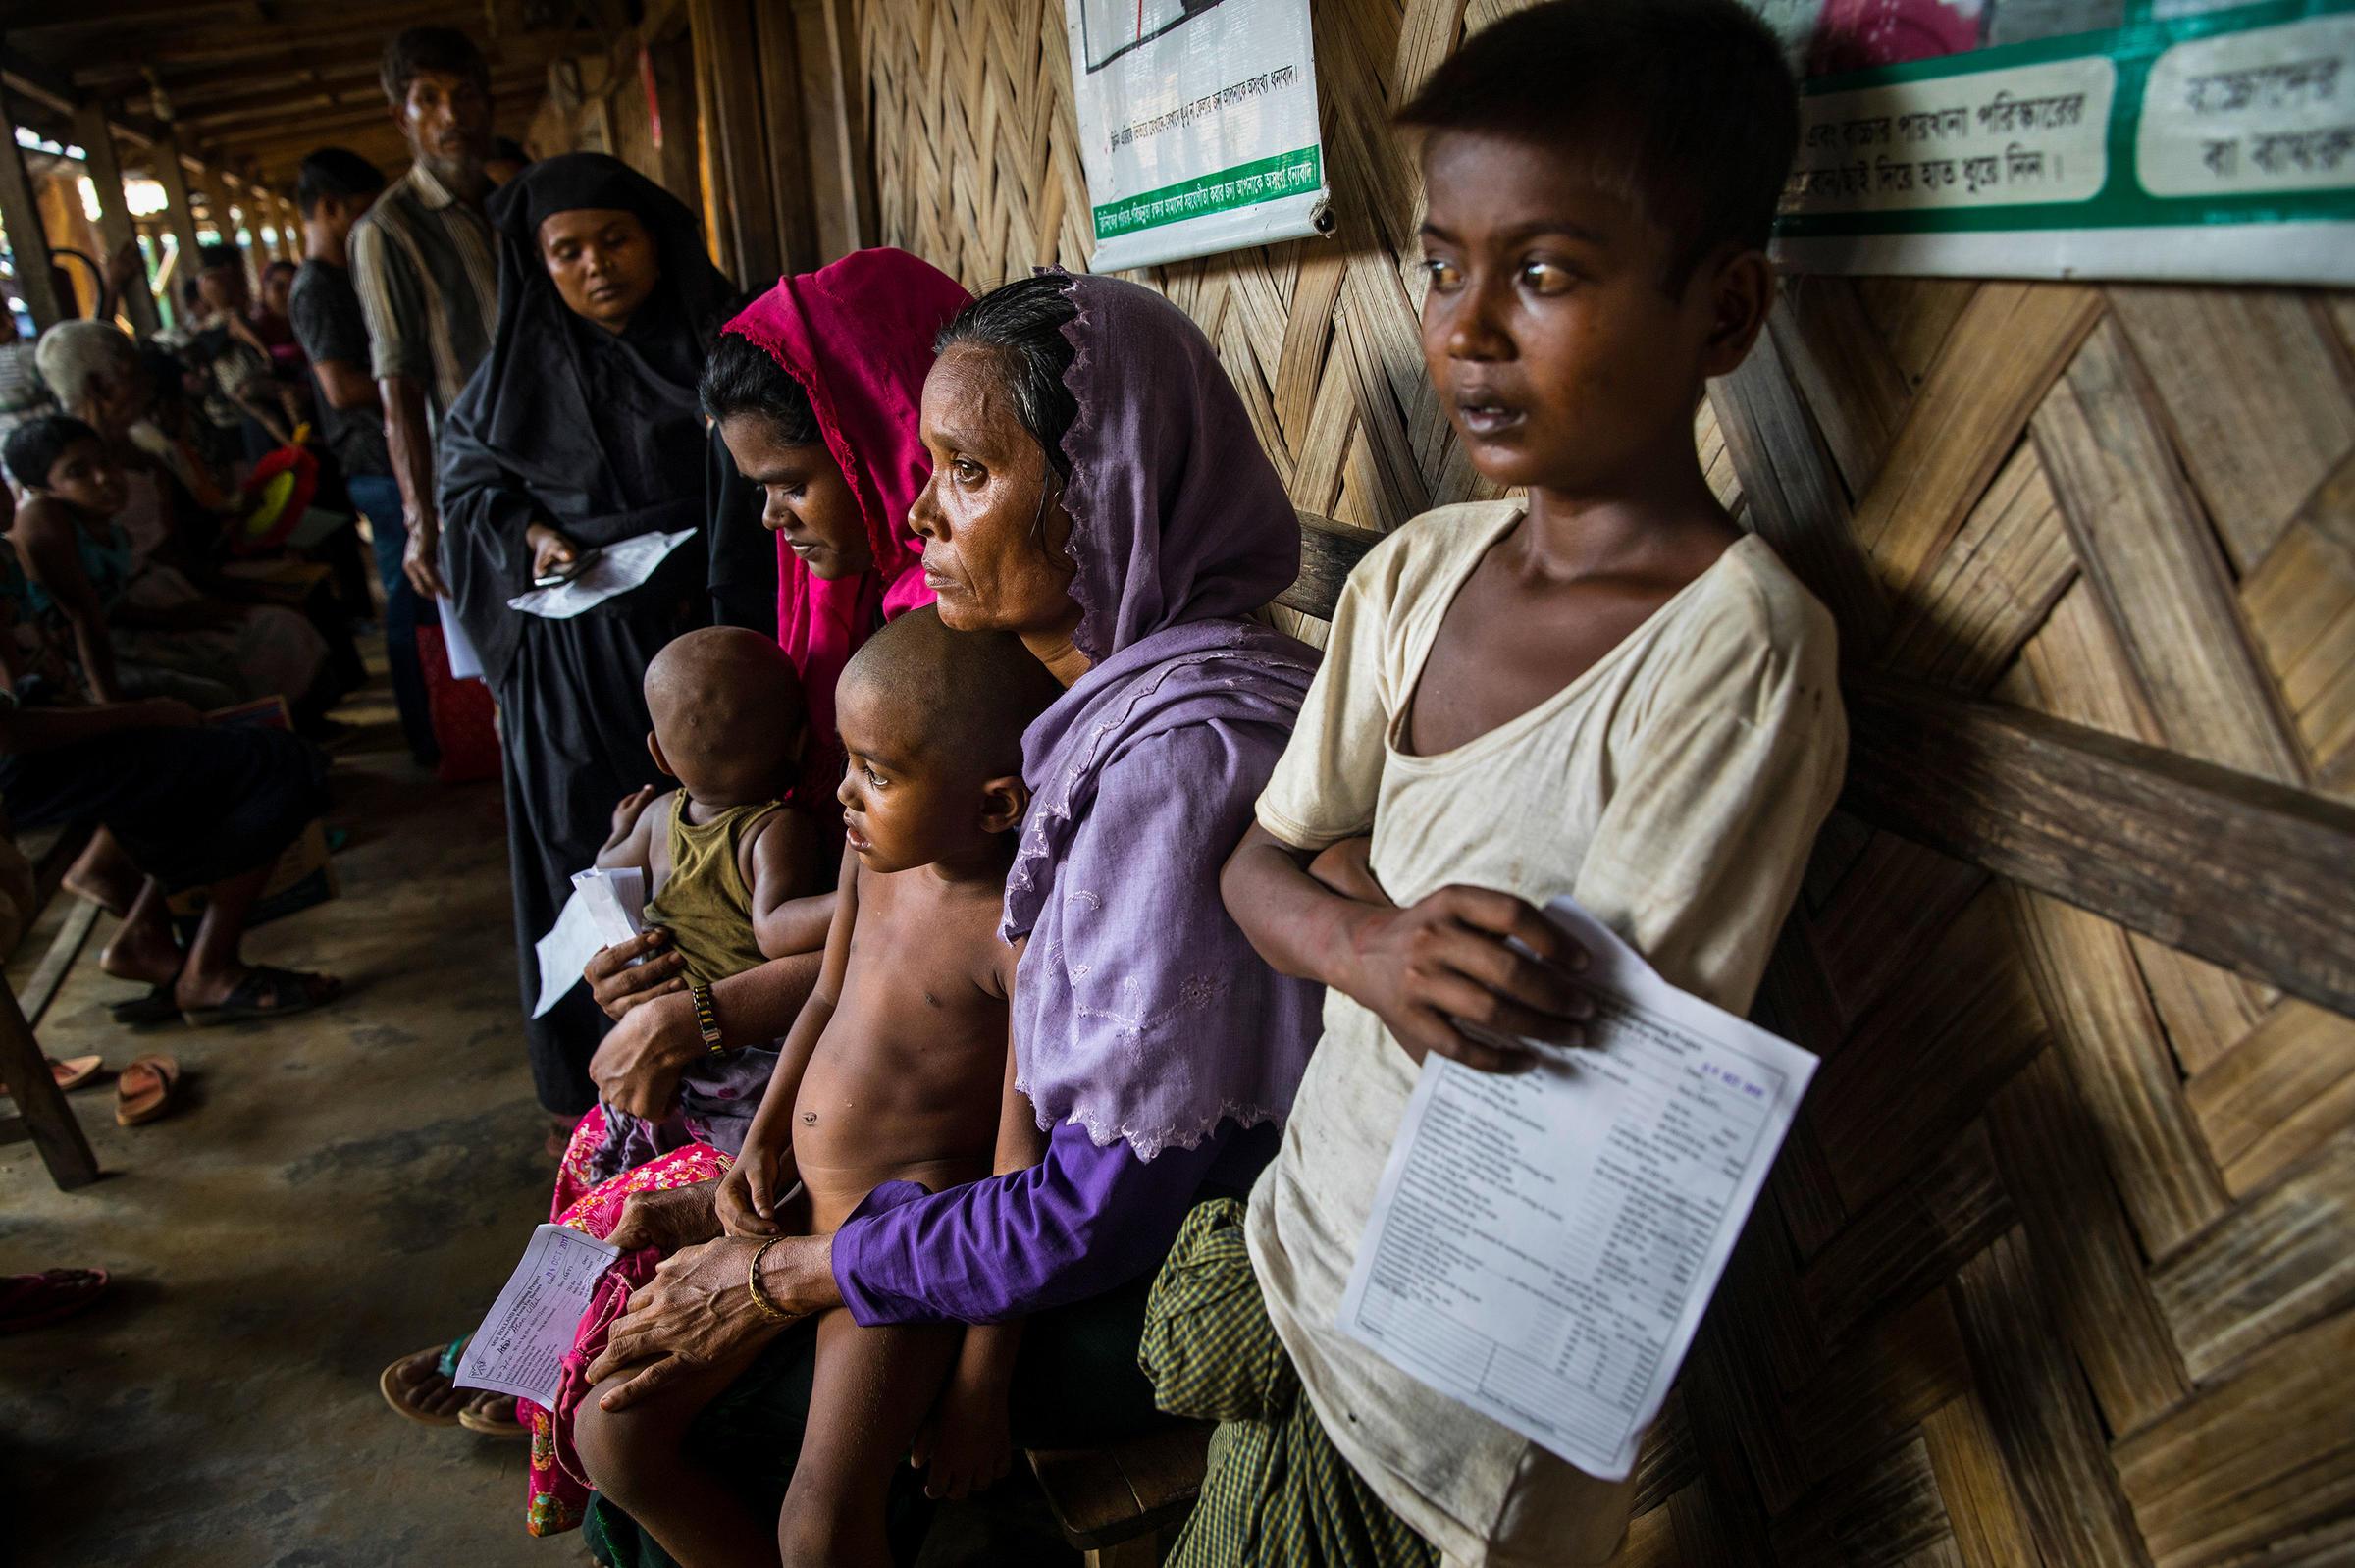 Myanmar troops gang-raped Rohingya women and girls- HRW